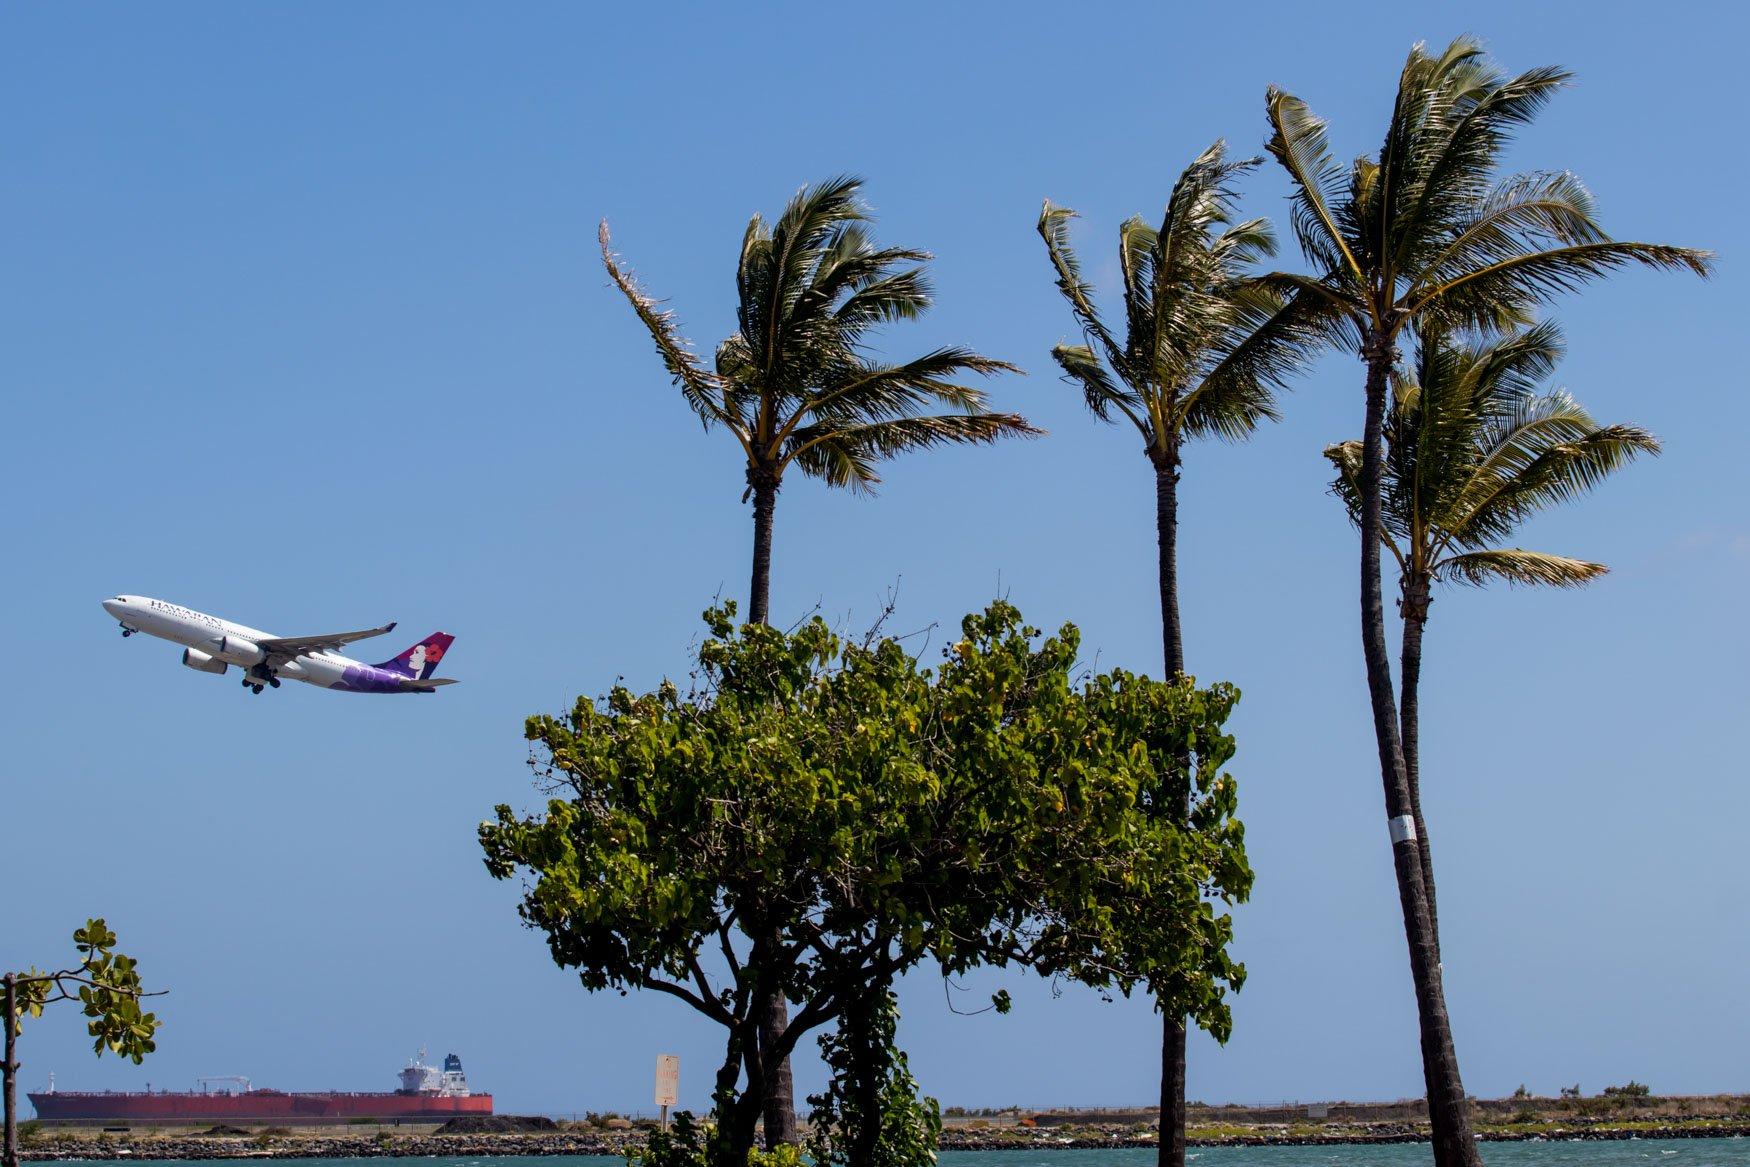 Hawaiian Airlines Honolulu Spotting